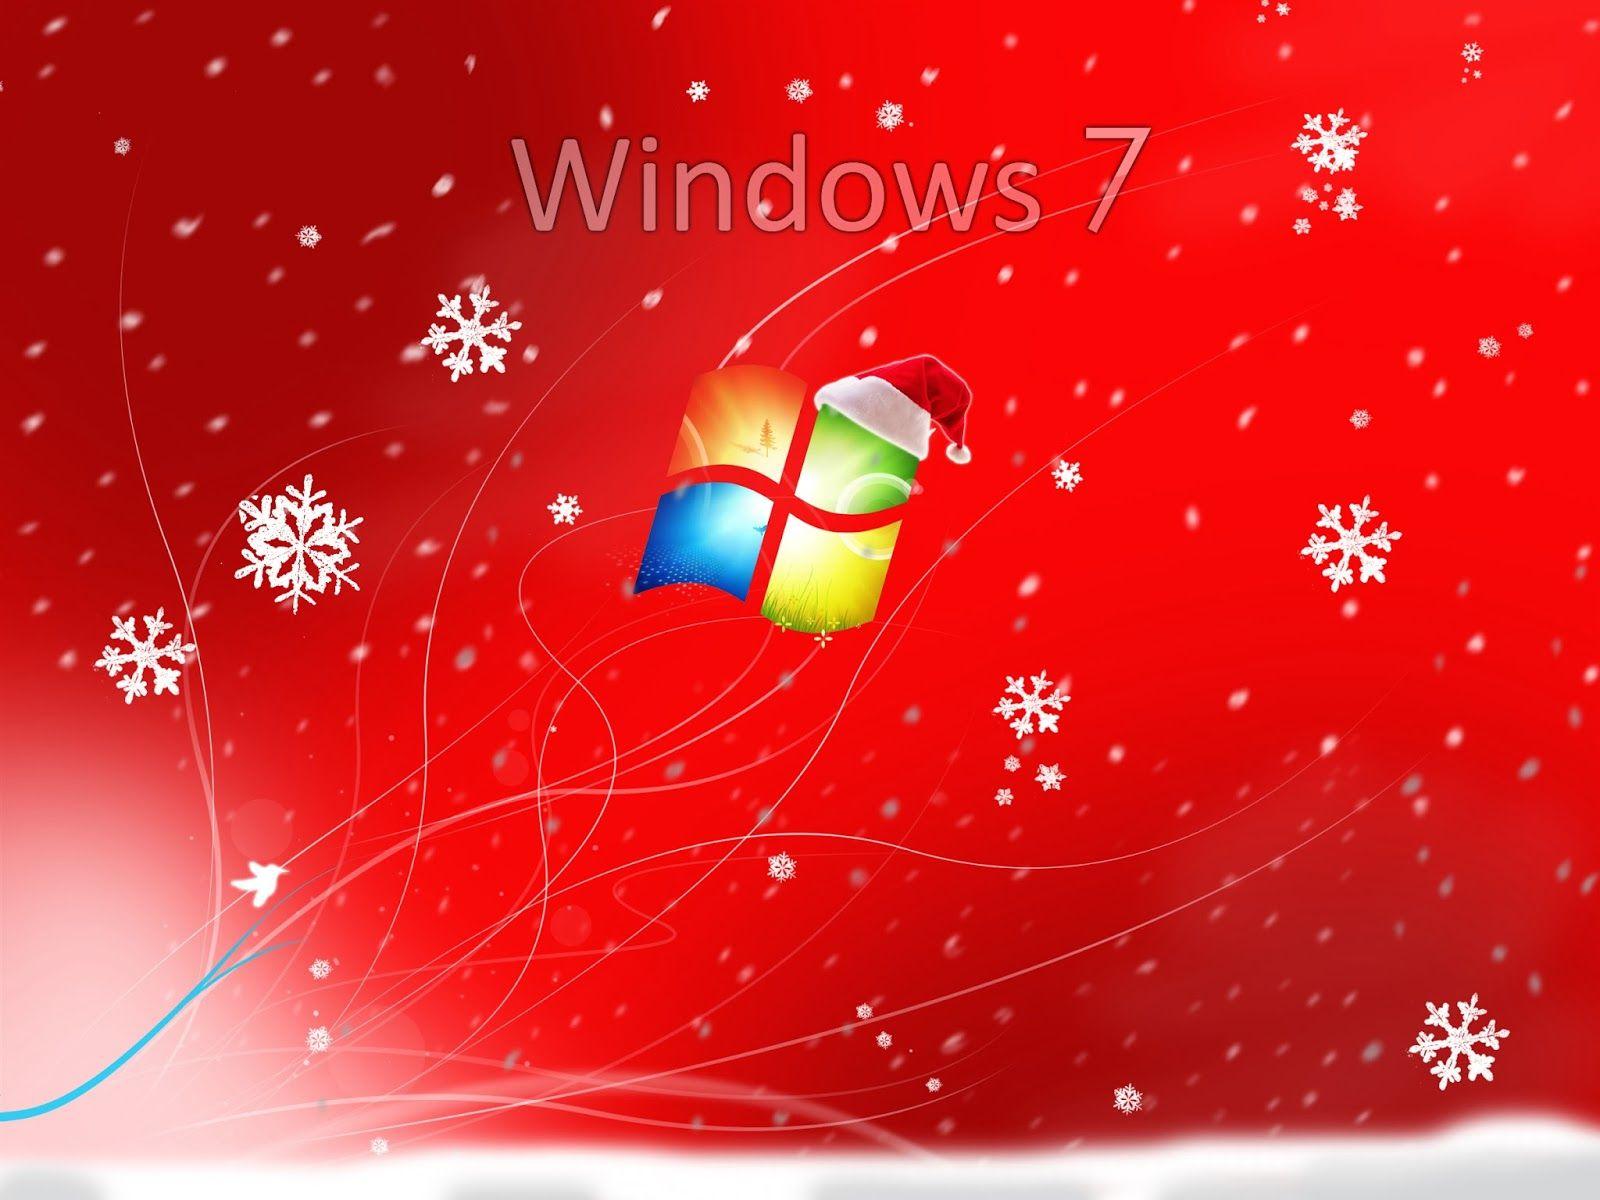 Hd Wallpapers Windows 7 Wallpaper Red Christmas Wallpaper Animated Christmas Wallpaper Christmas Screen Savers